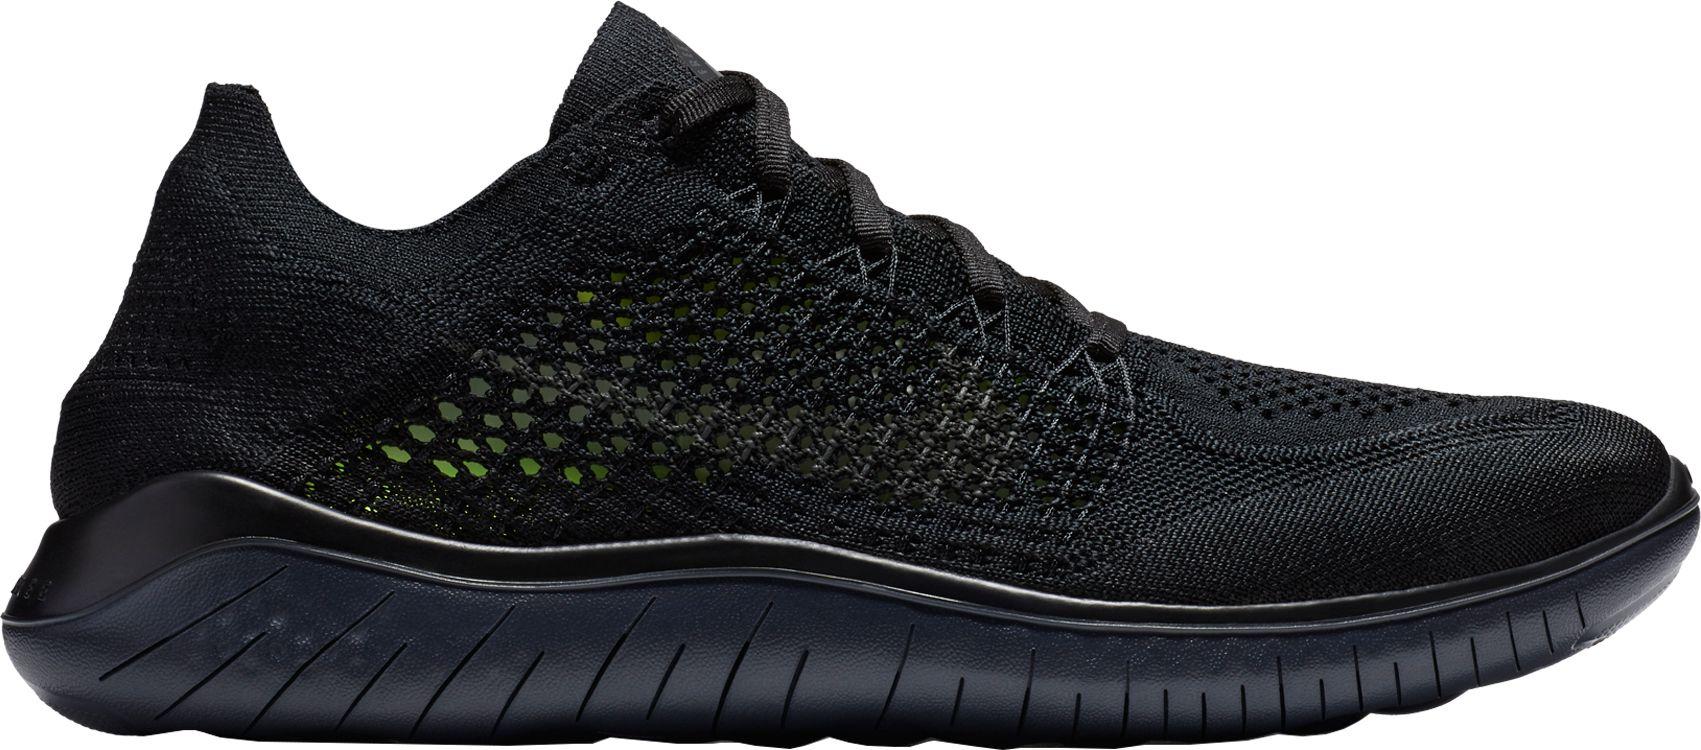 Nike Men's Free Rn Flyknit 2018 Running Shoes by Nike